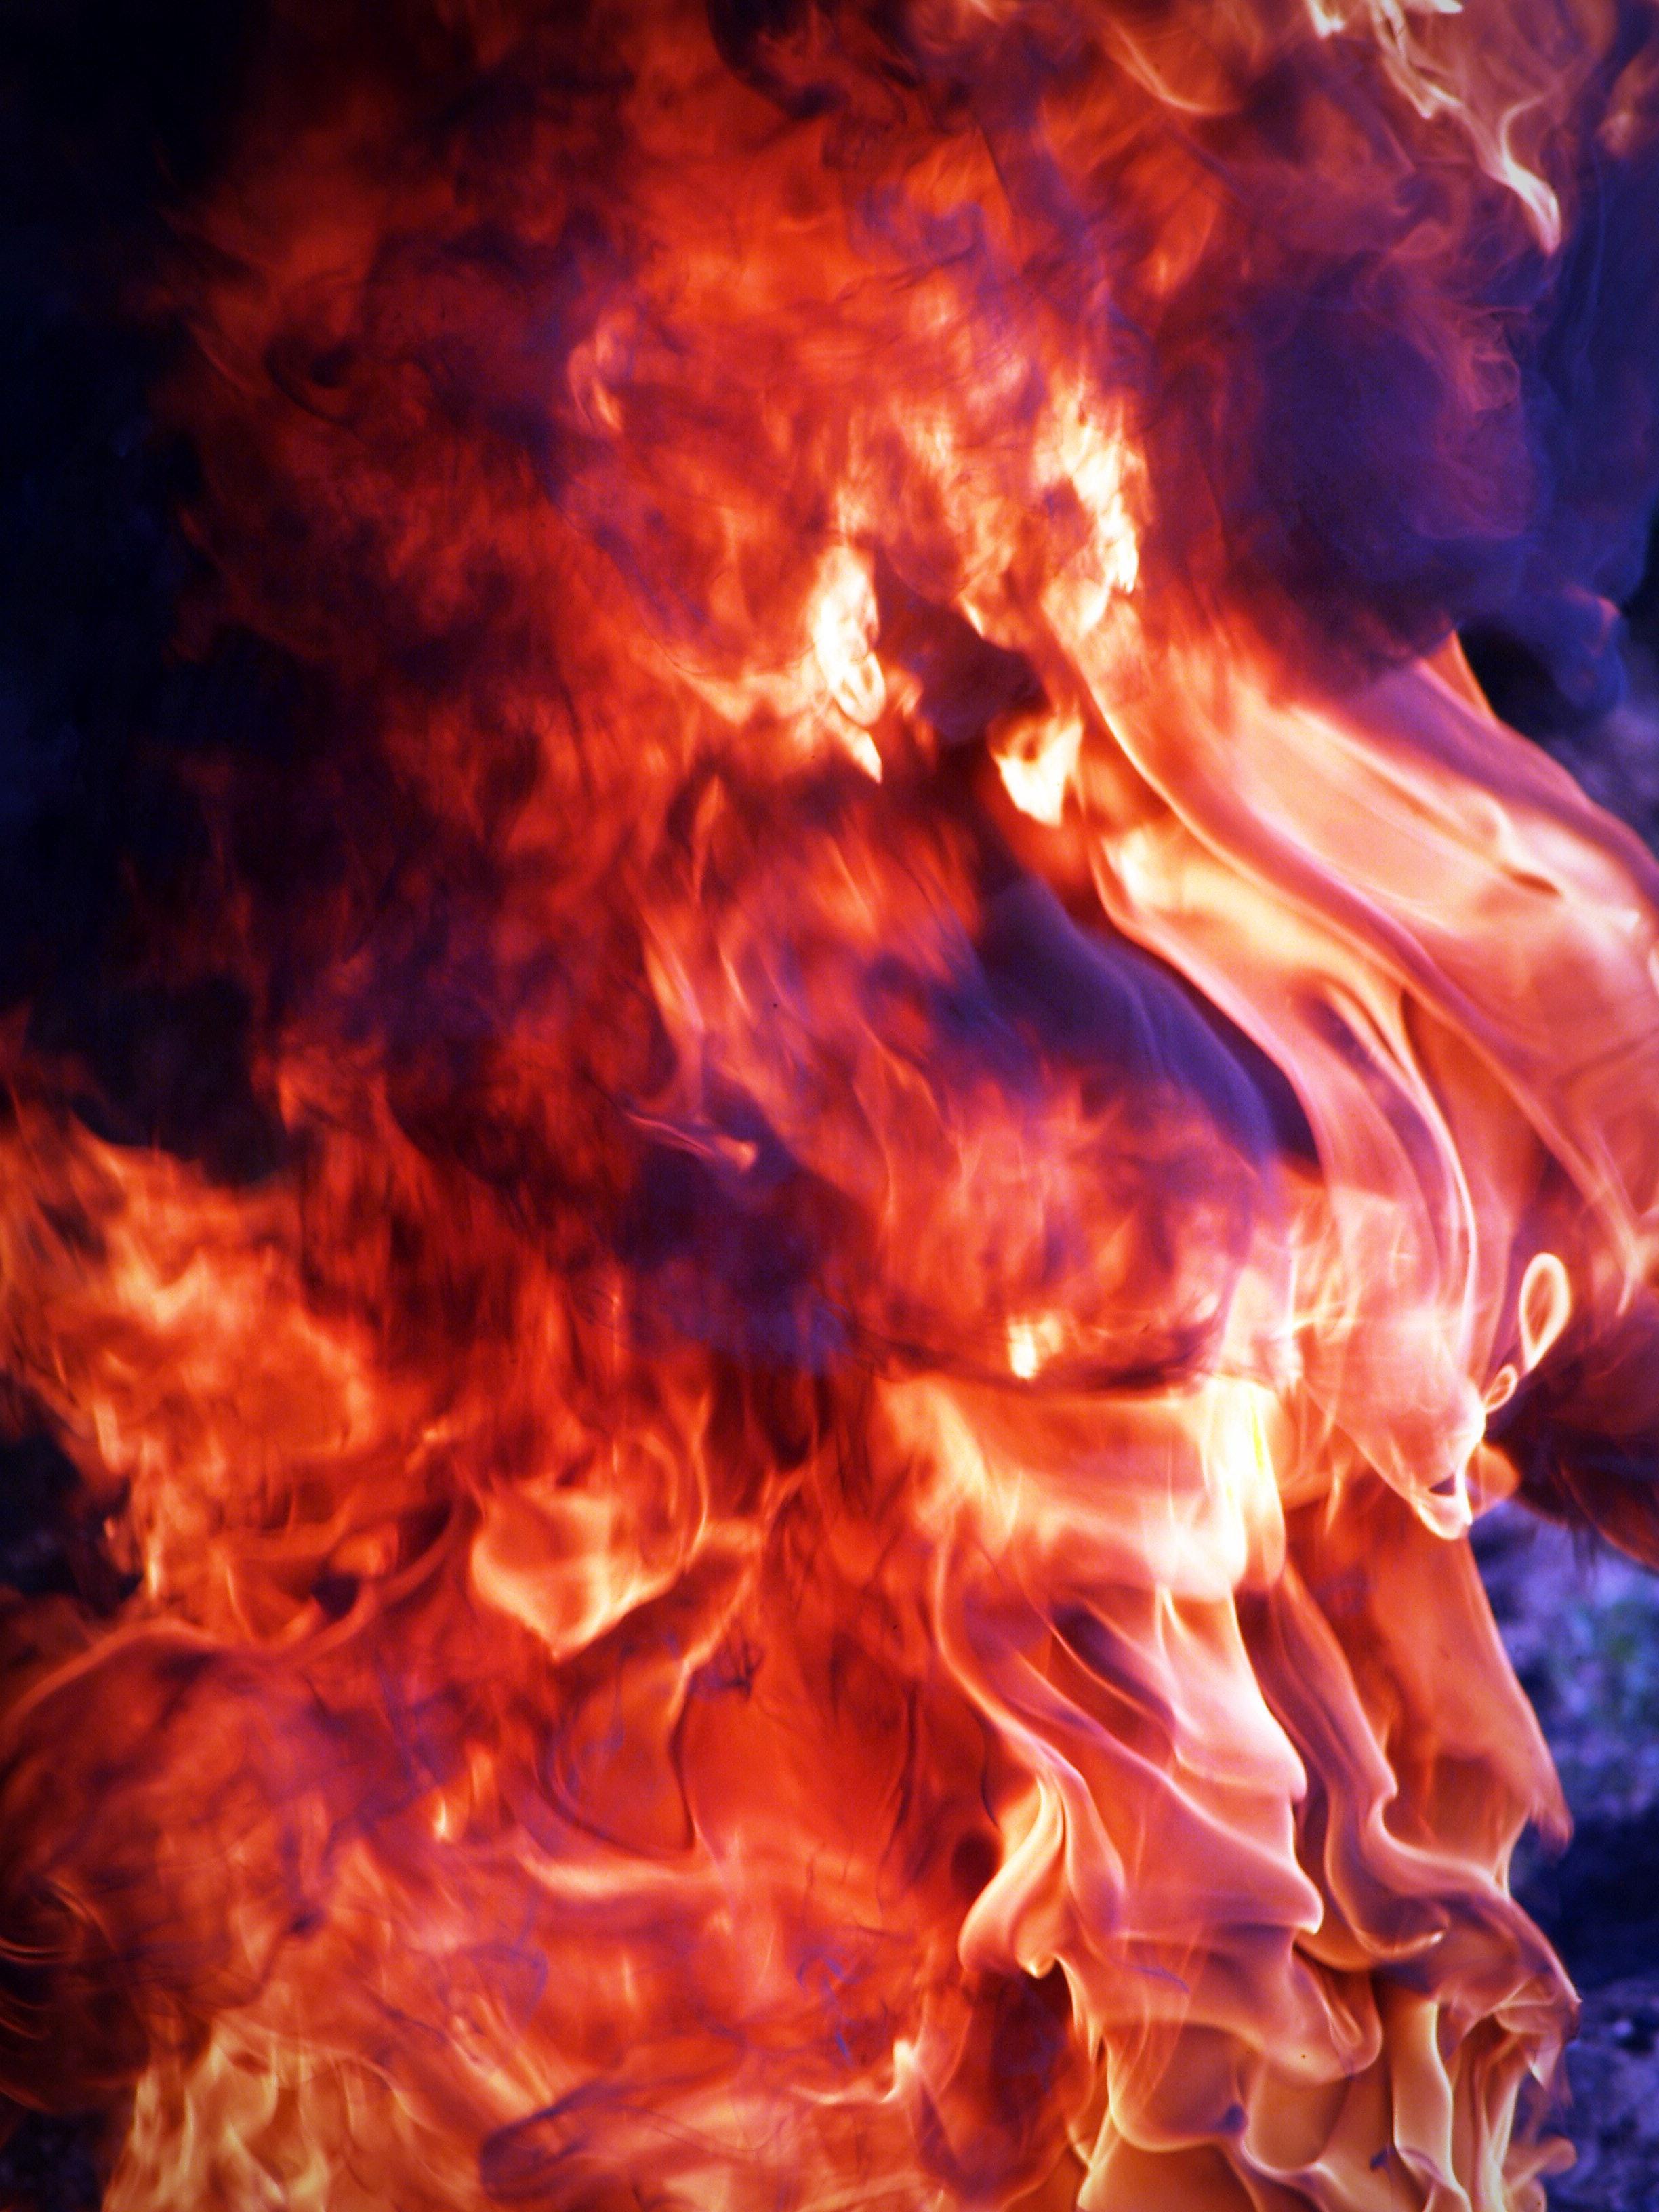 Fire Wallpaper 183 Free Stock Photo